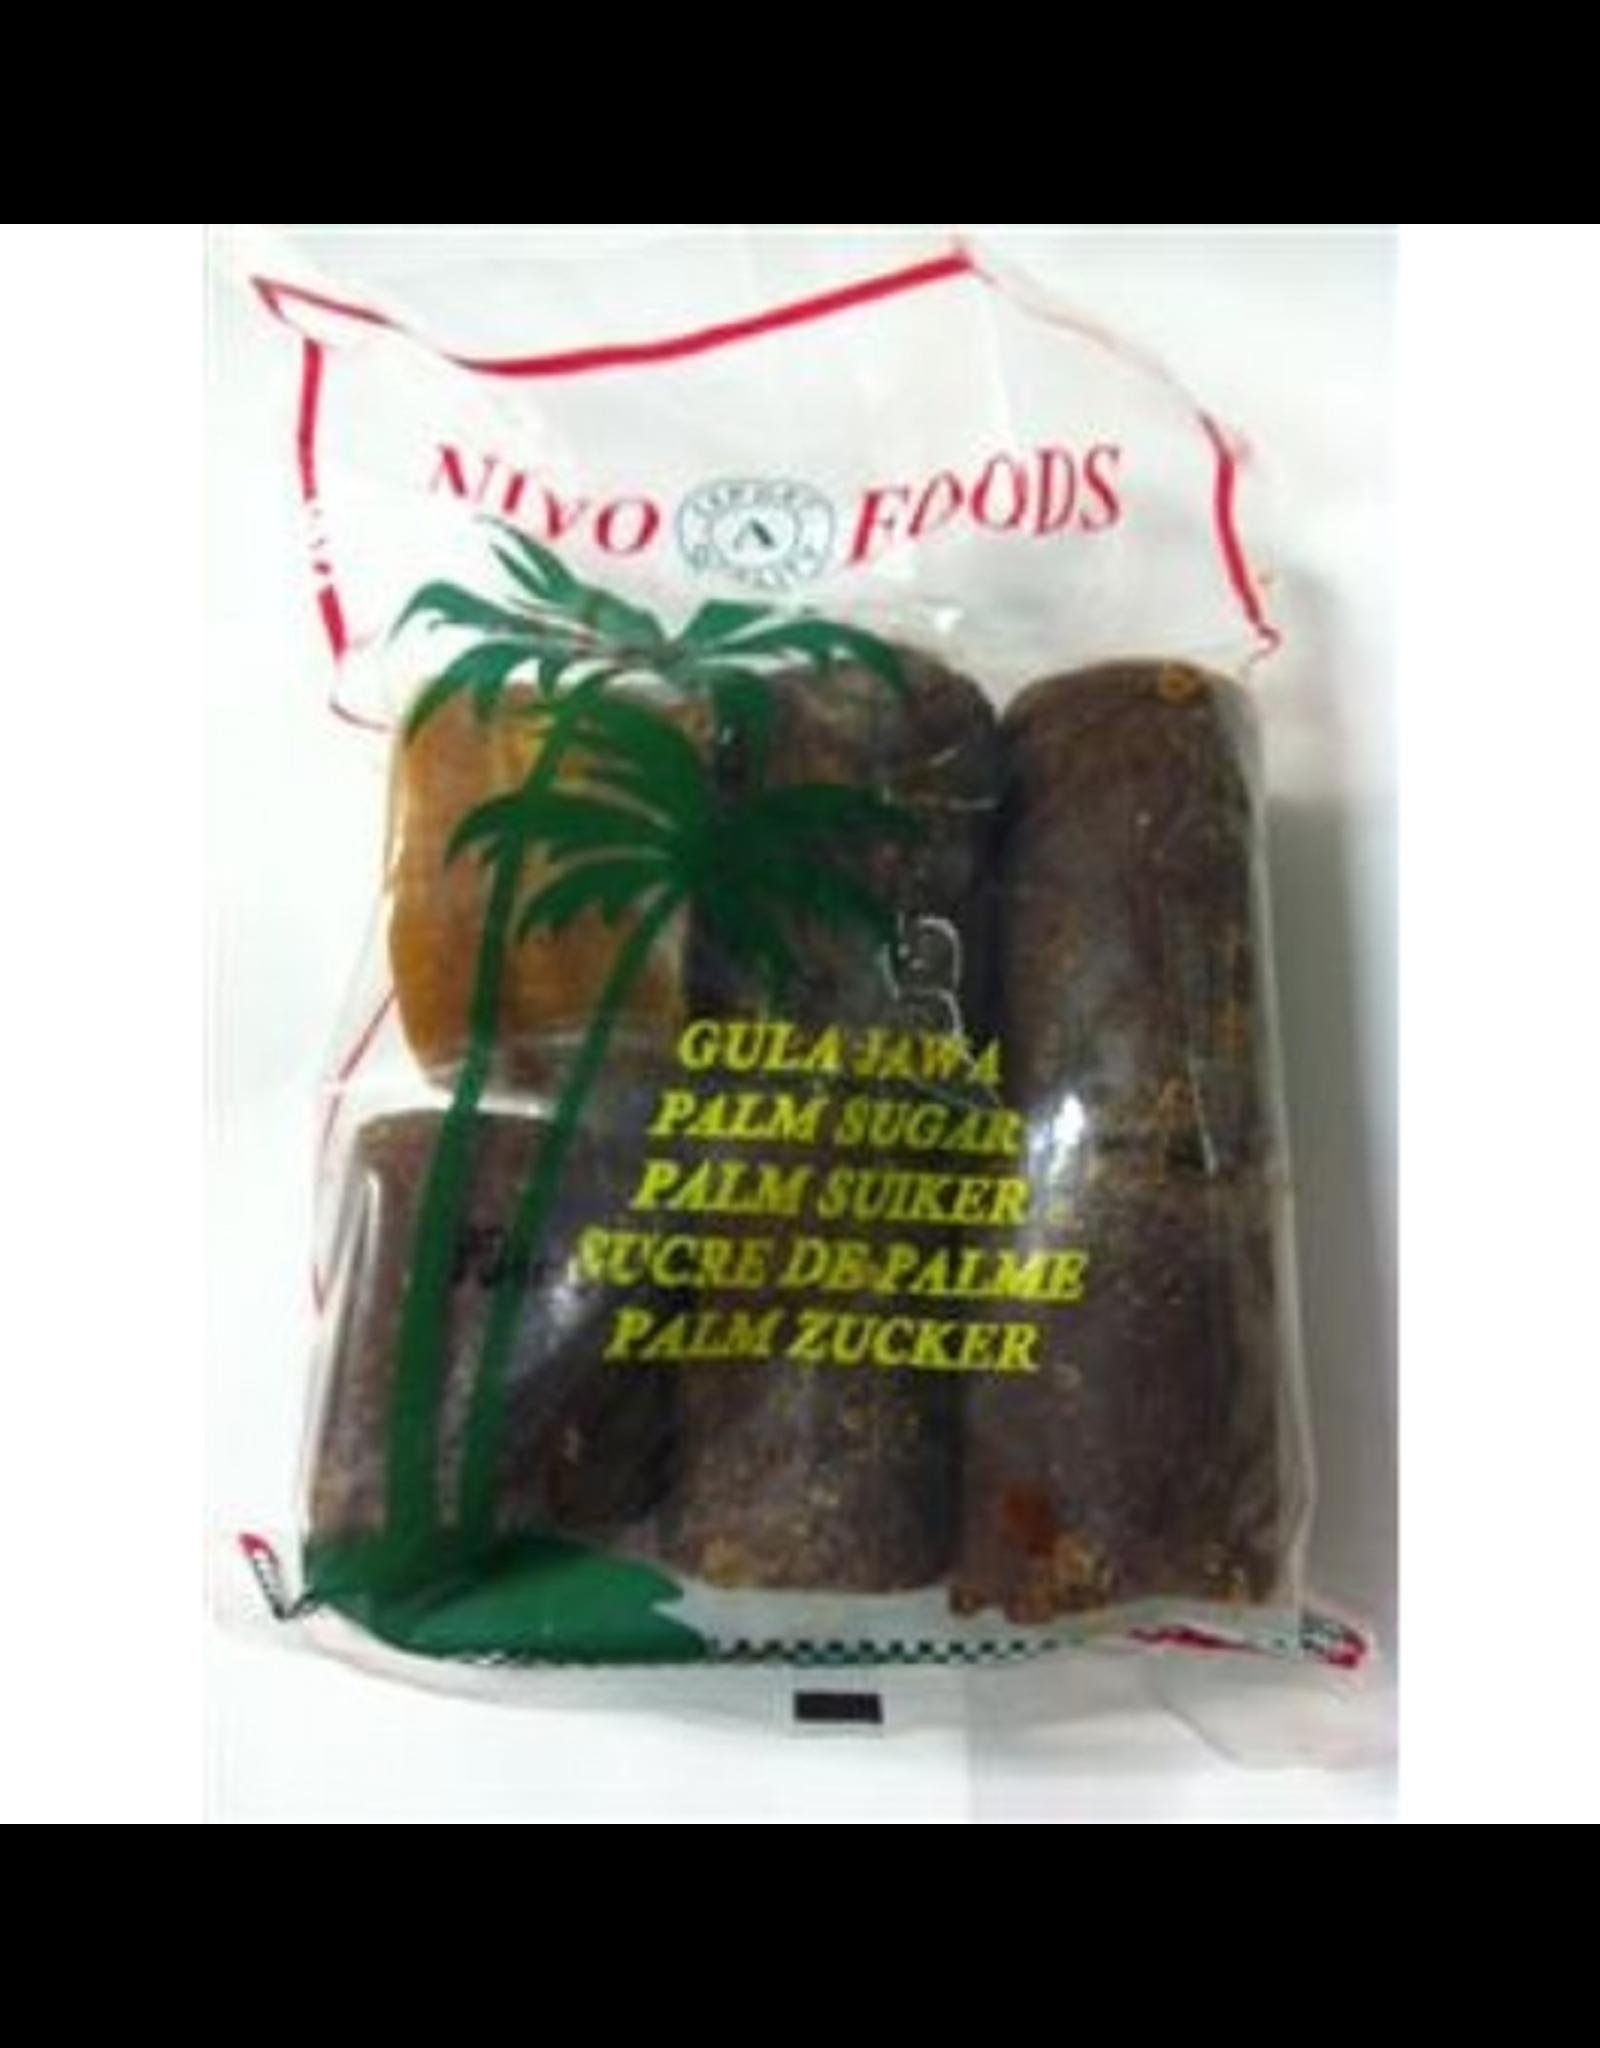 Nivo Foods Gula Jawa Palm suiker blok 100%